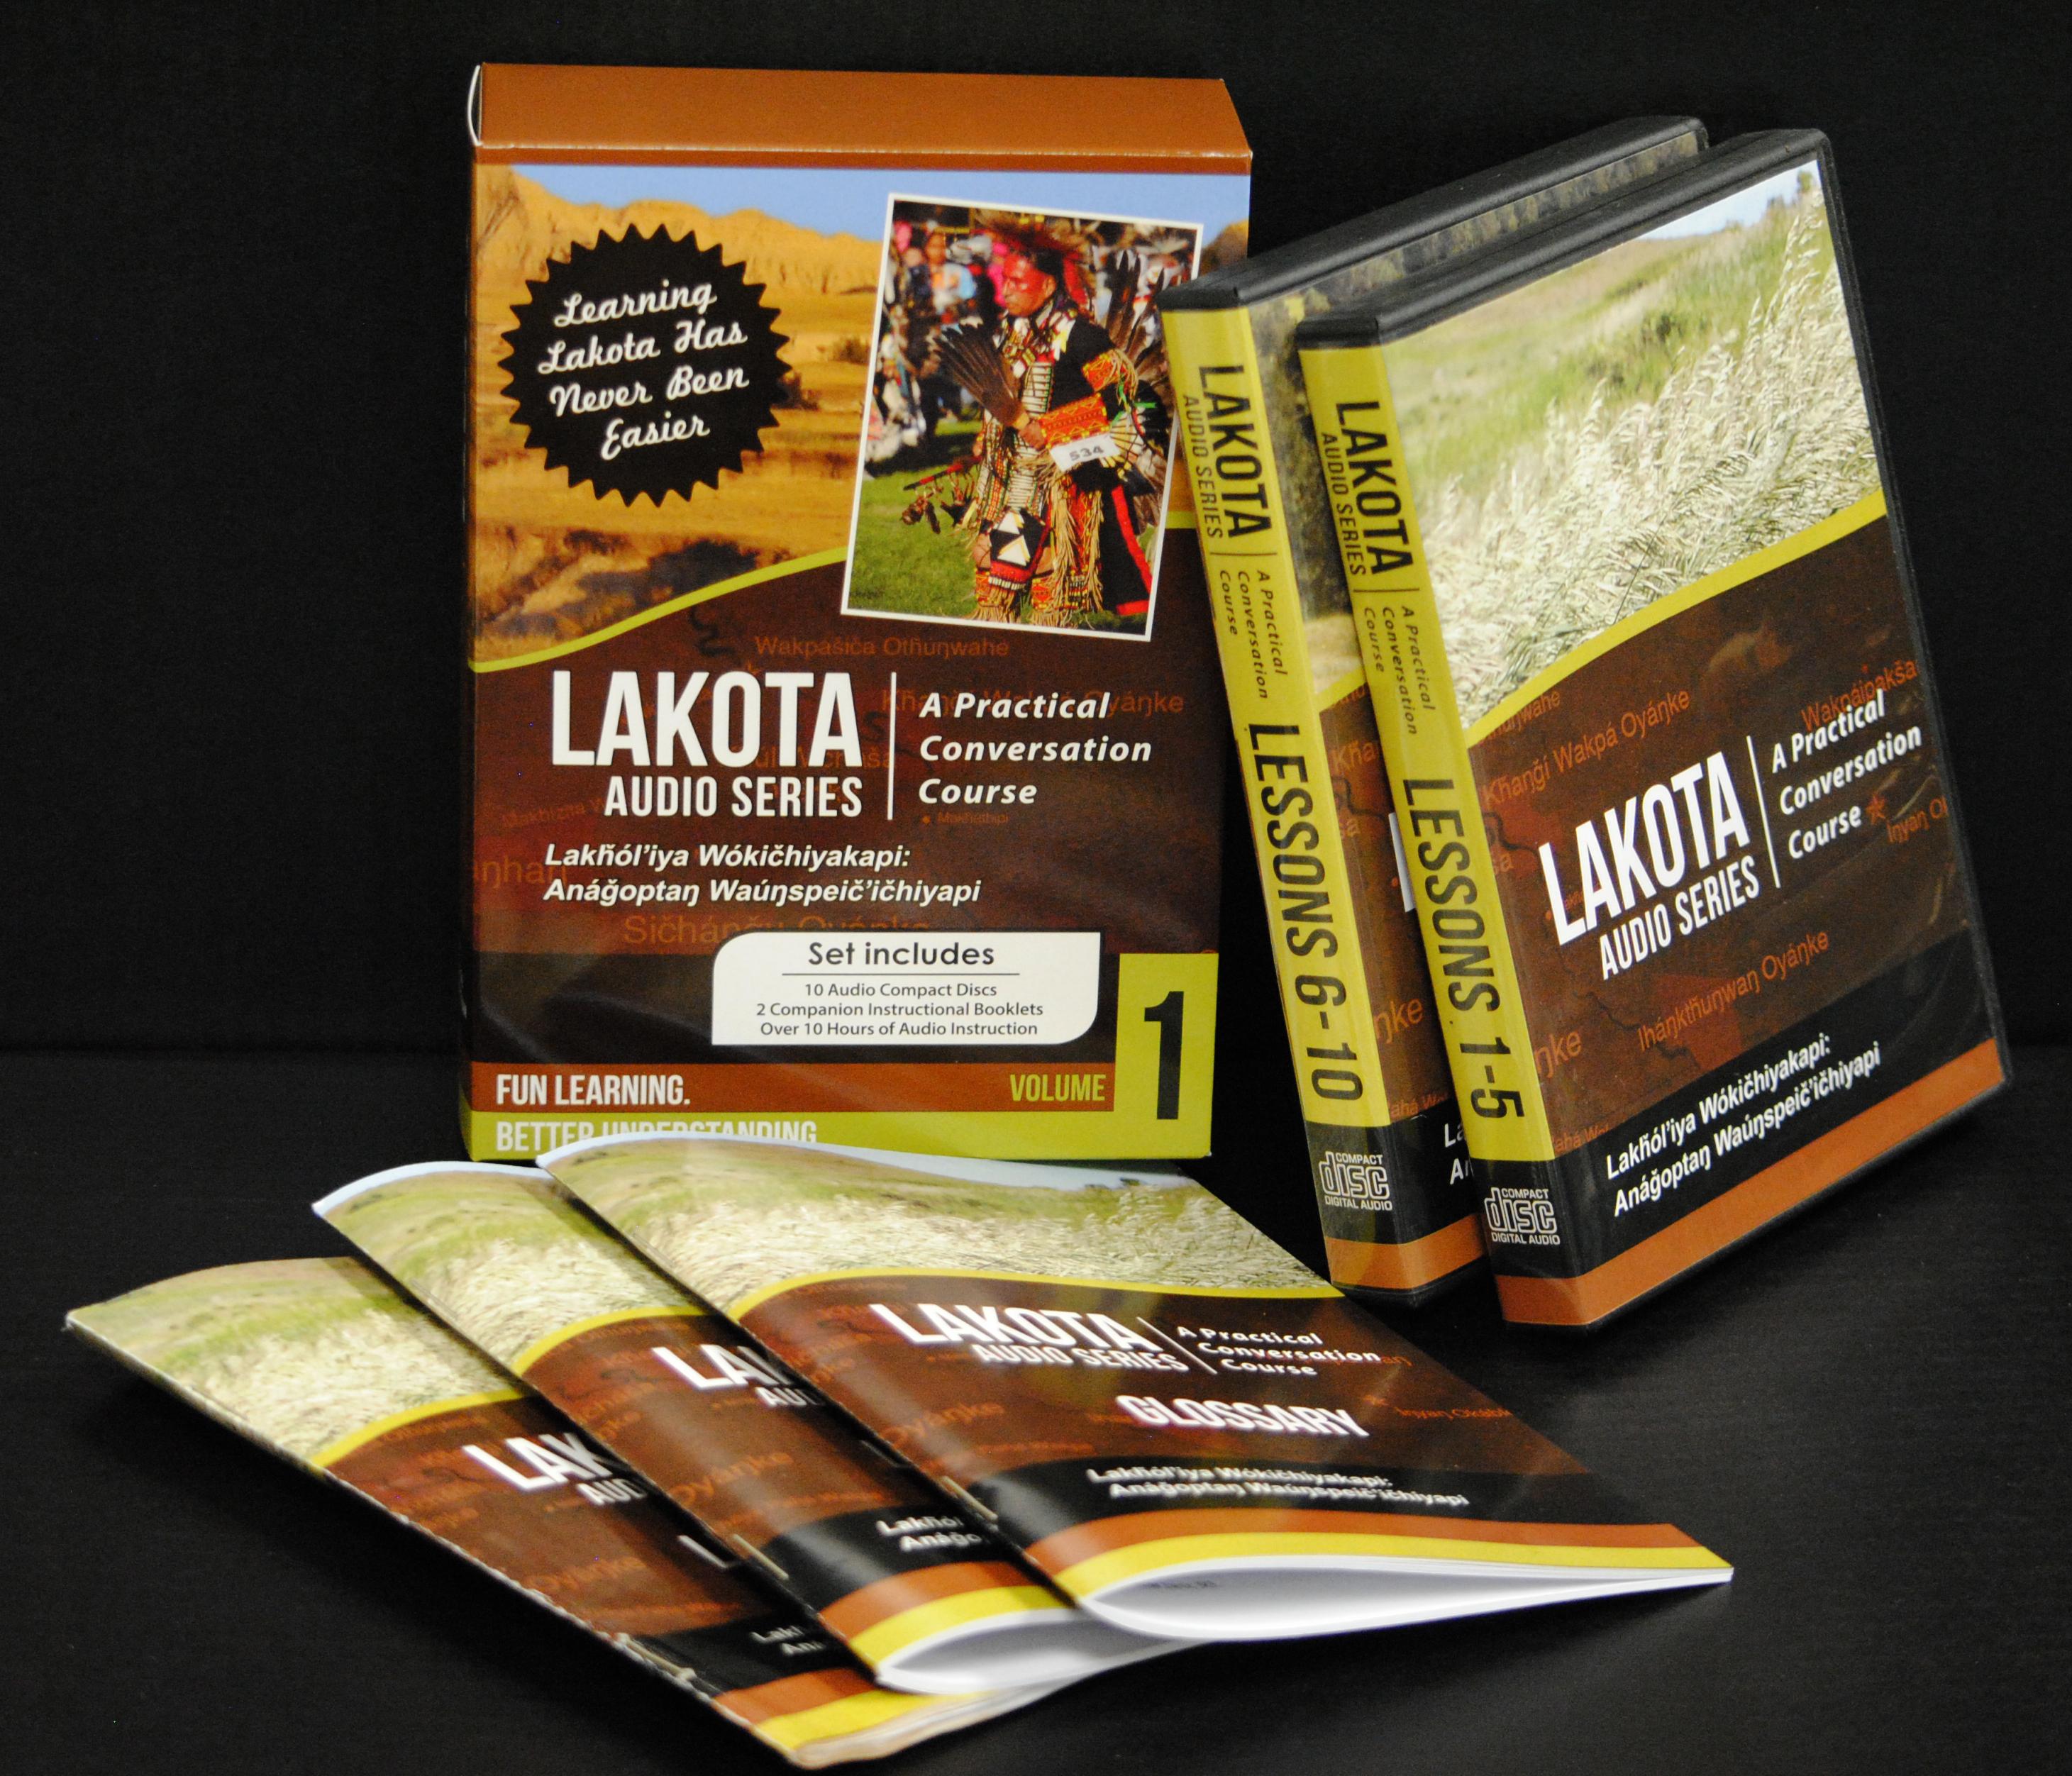 Final Full Lakota Audio Series